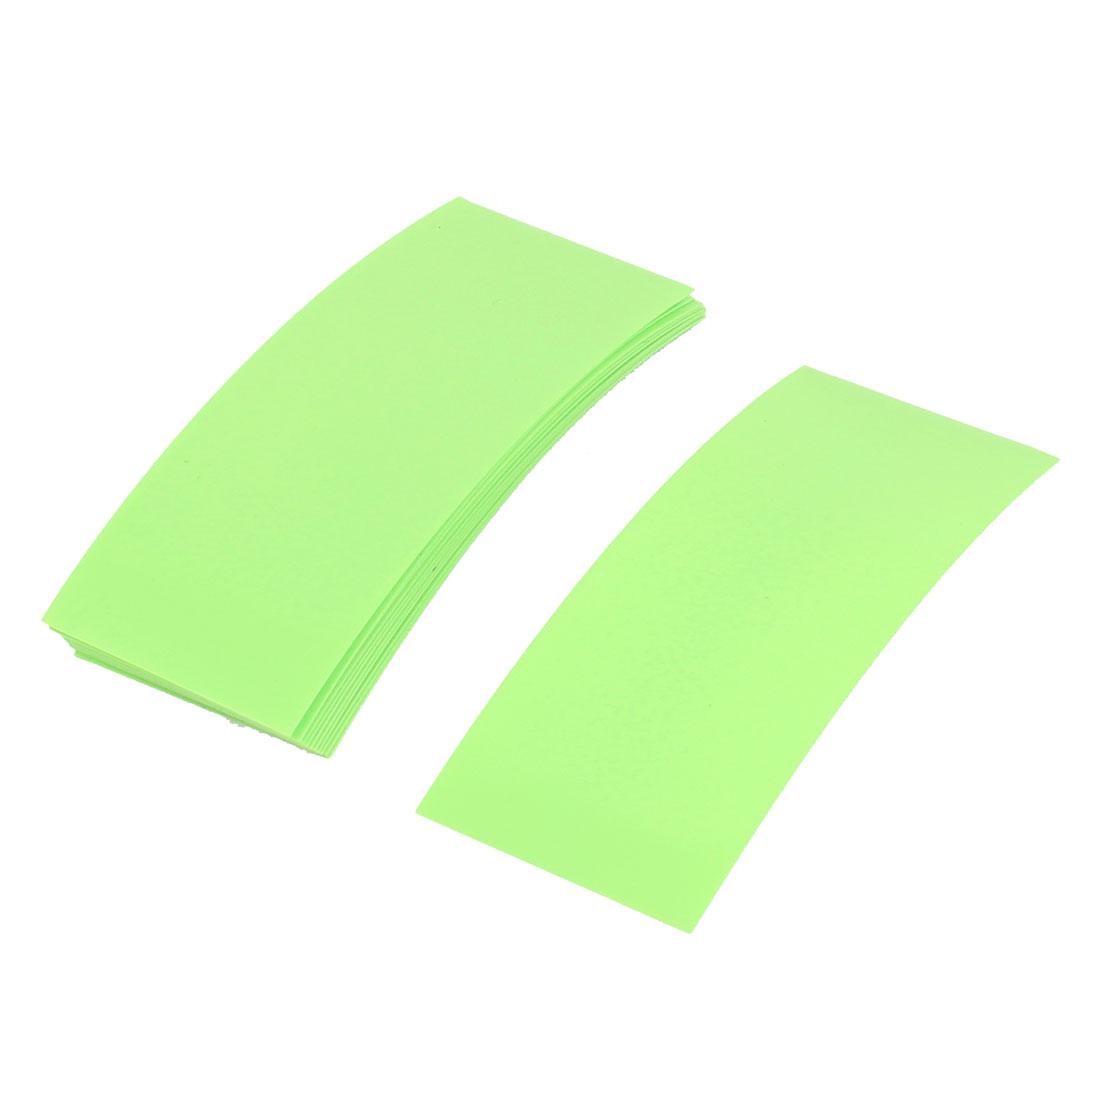 10pcs 72mm x 18.5mm PVC Heat Shrink Tubing Fruit Green for 1 x 18650 Battery